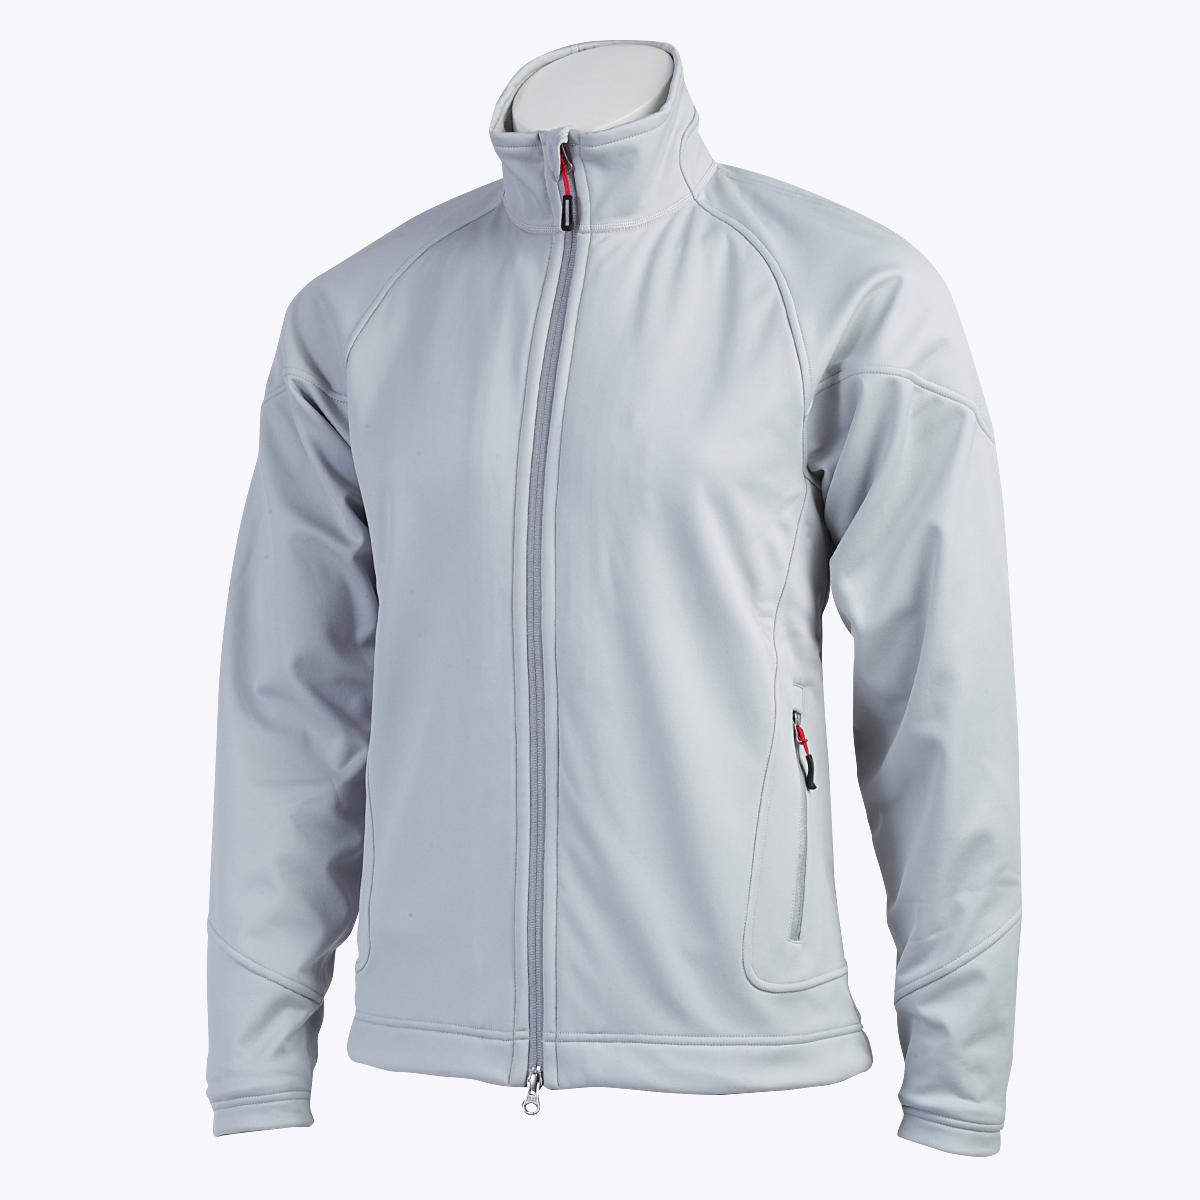 Team One Newport Men's Scrambler Jacket (31001)